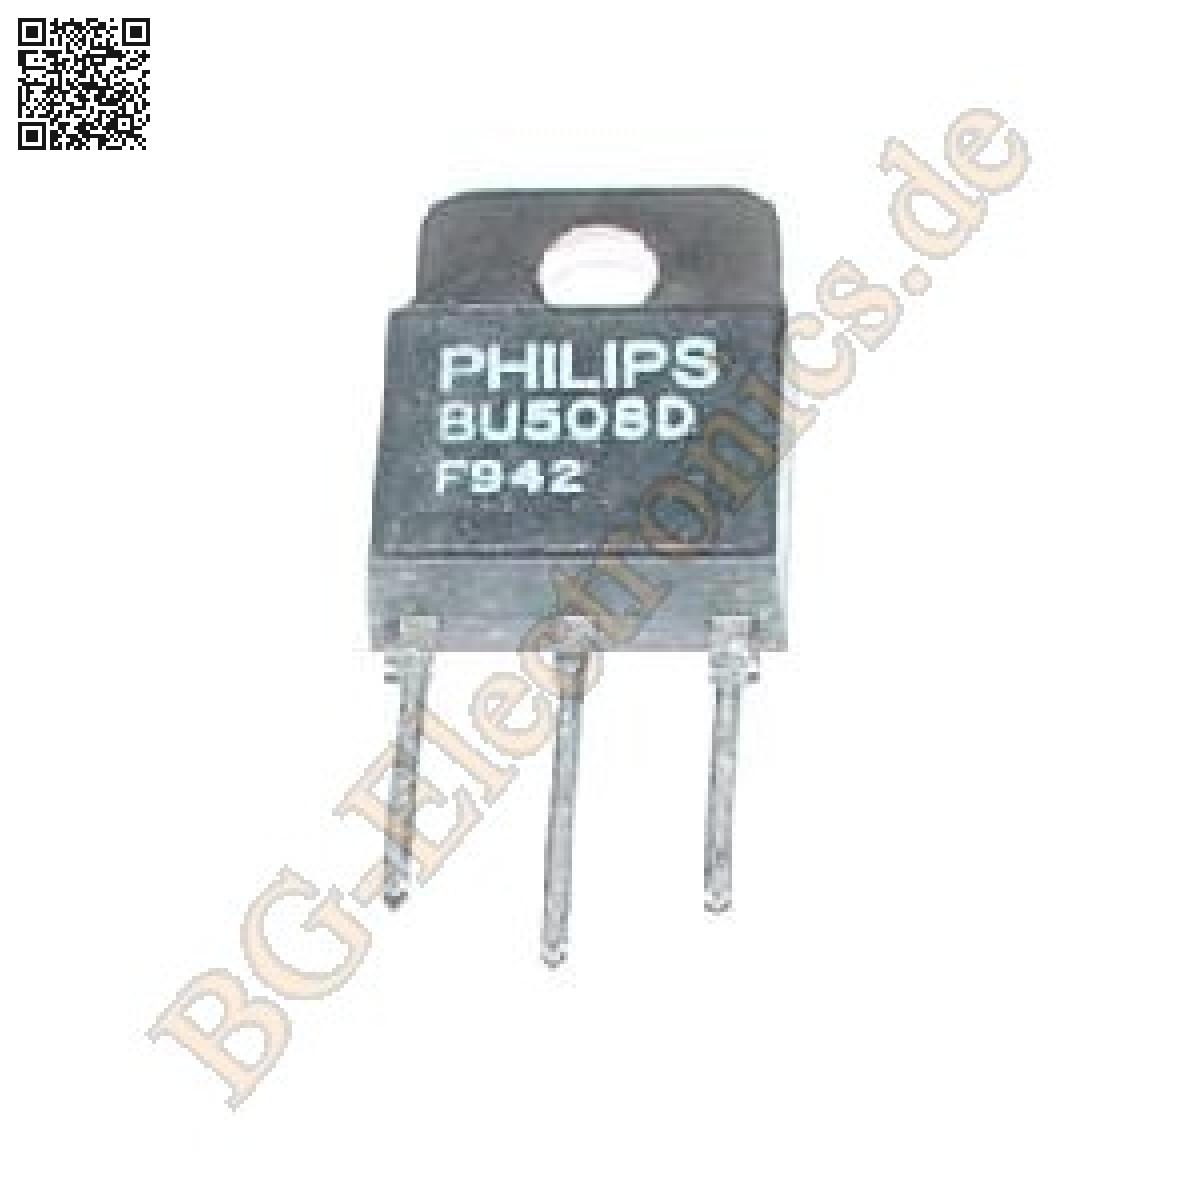 1Pcs BUT34 to-3 50 Amperes Npn Power Darlington Transistor 850 Volts 2